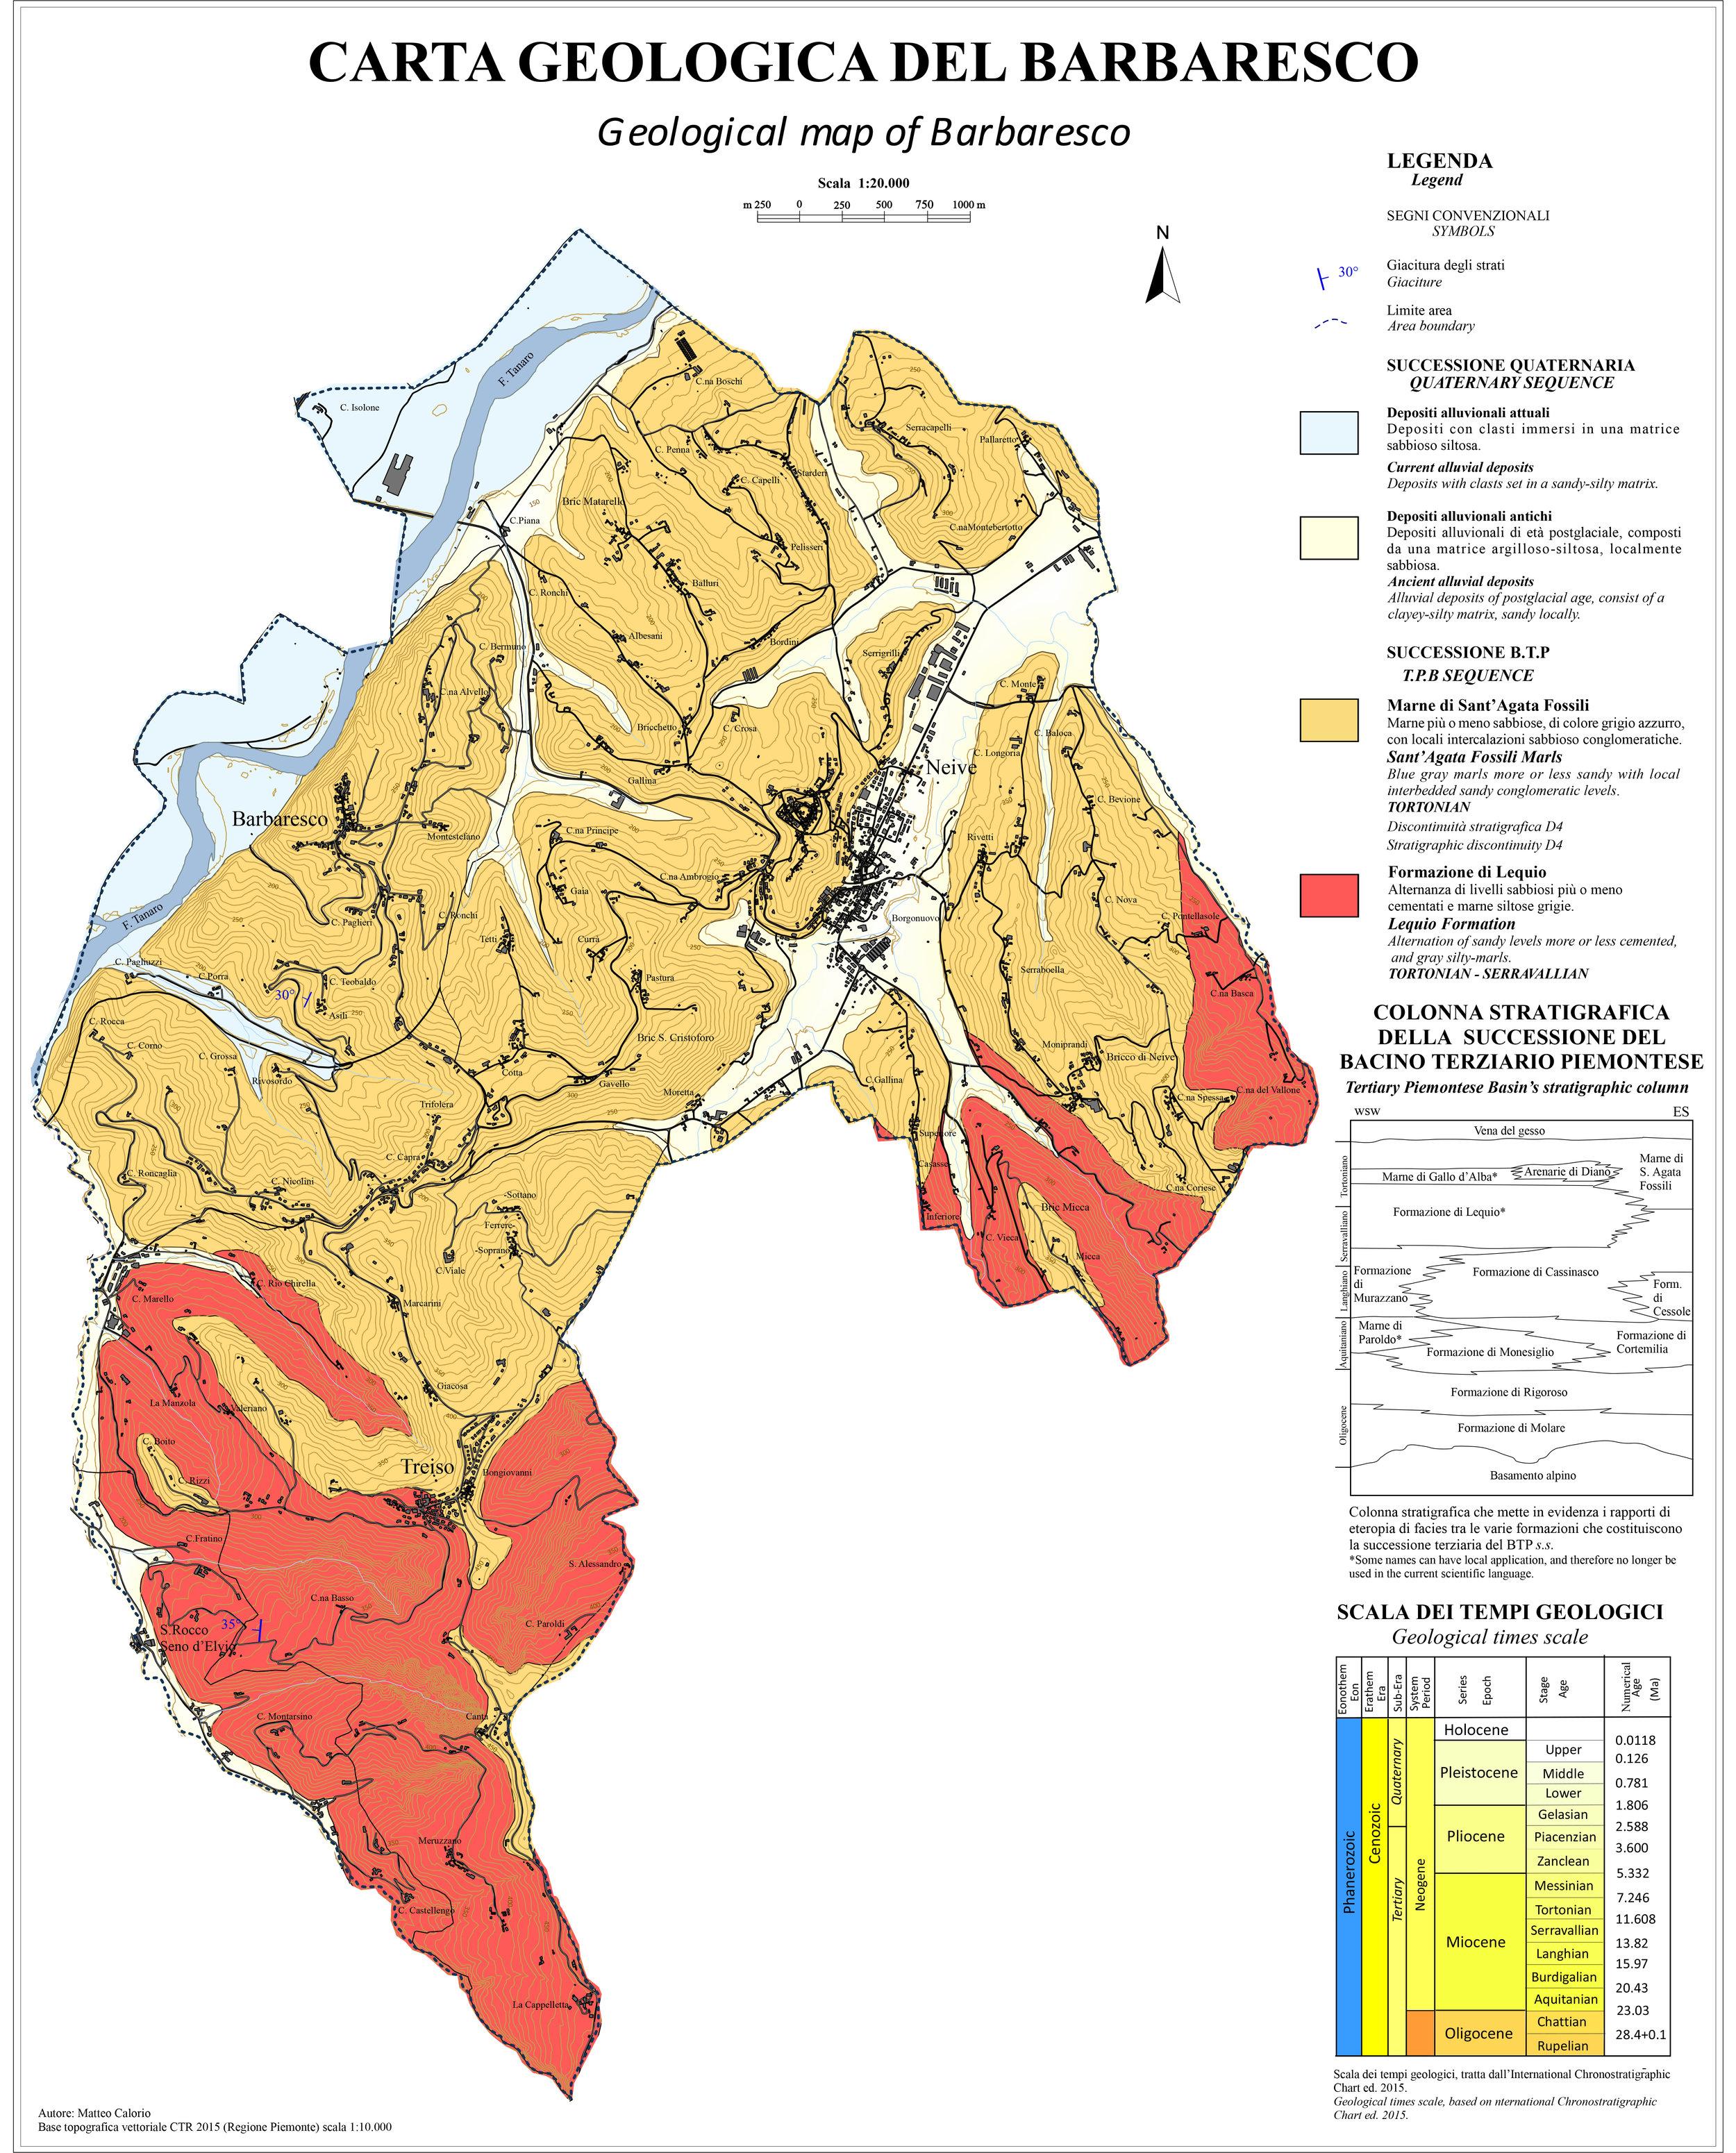 Carta geologica Barbaresco cantina rizzi treiso piemonte langhe roero.jpg